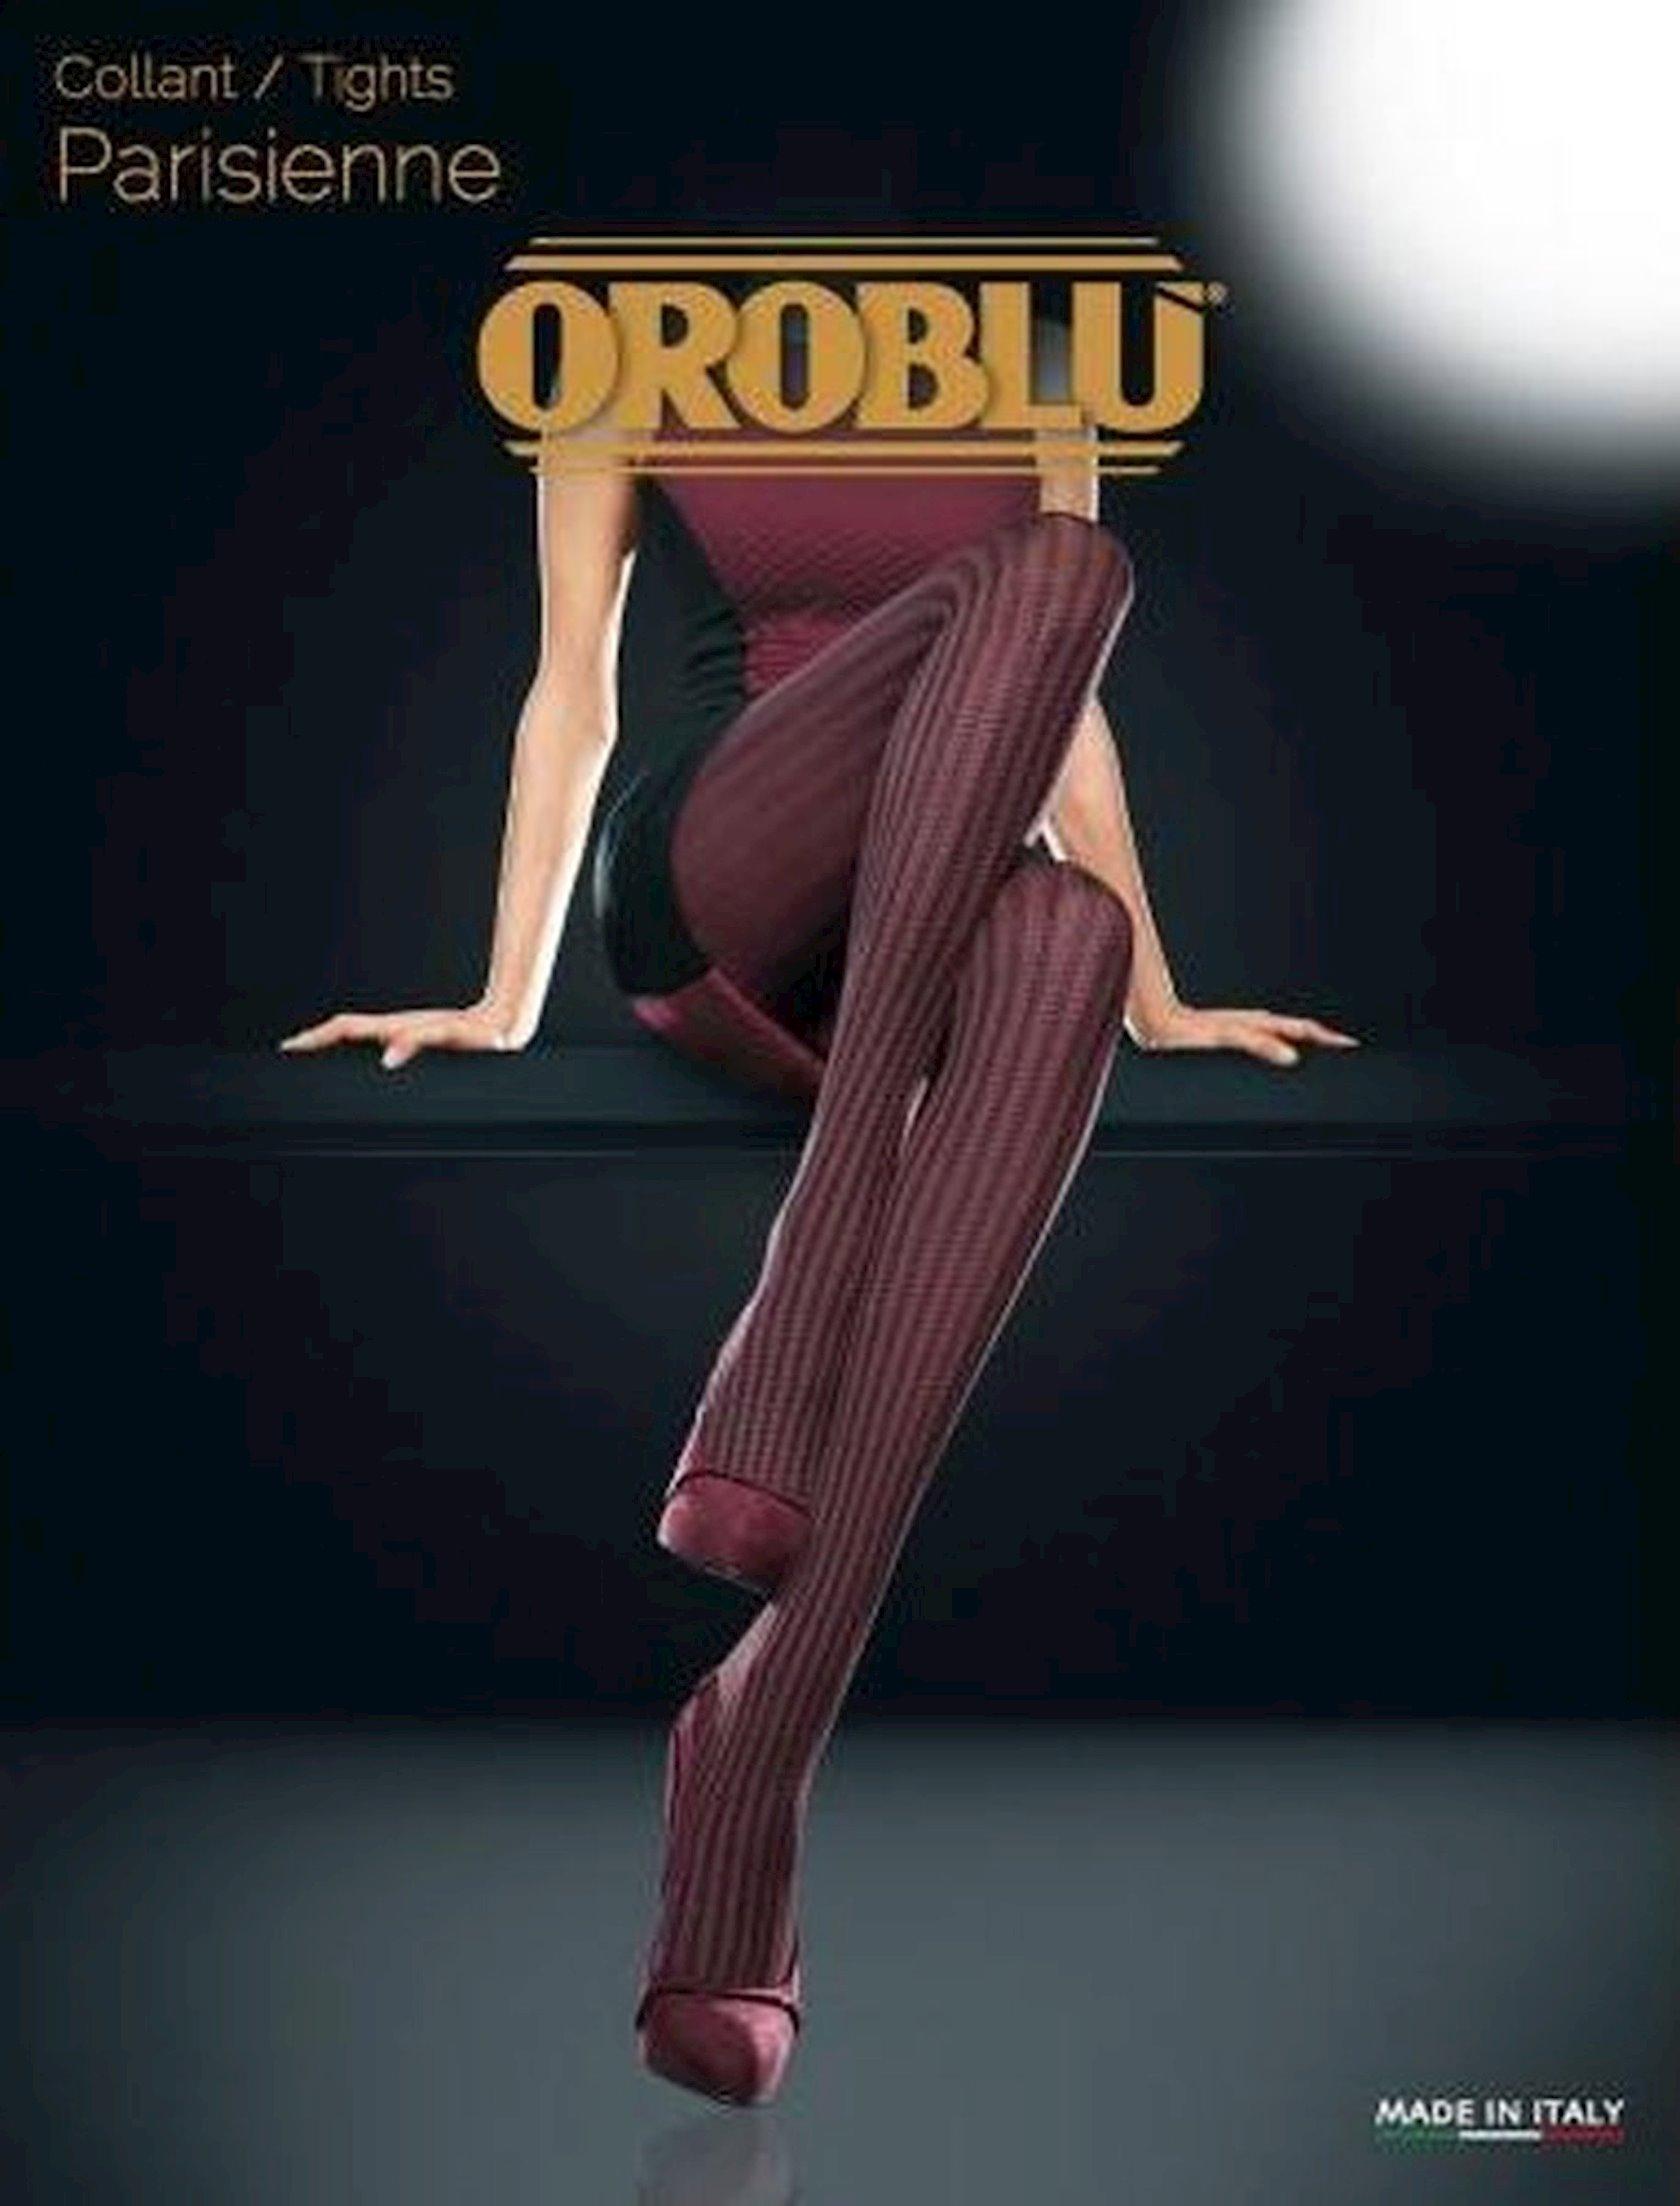 Kolqotqa Oroblu Parisienne, 50den, ölçü 4(L), Bordeaux, tünd qırmızı